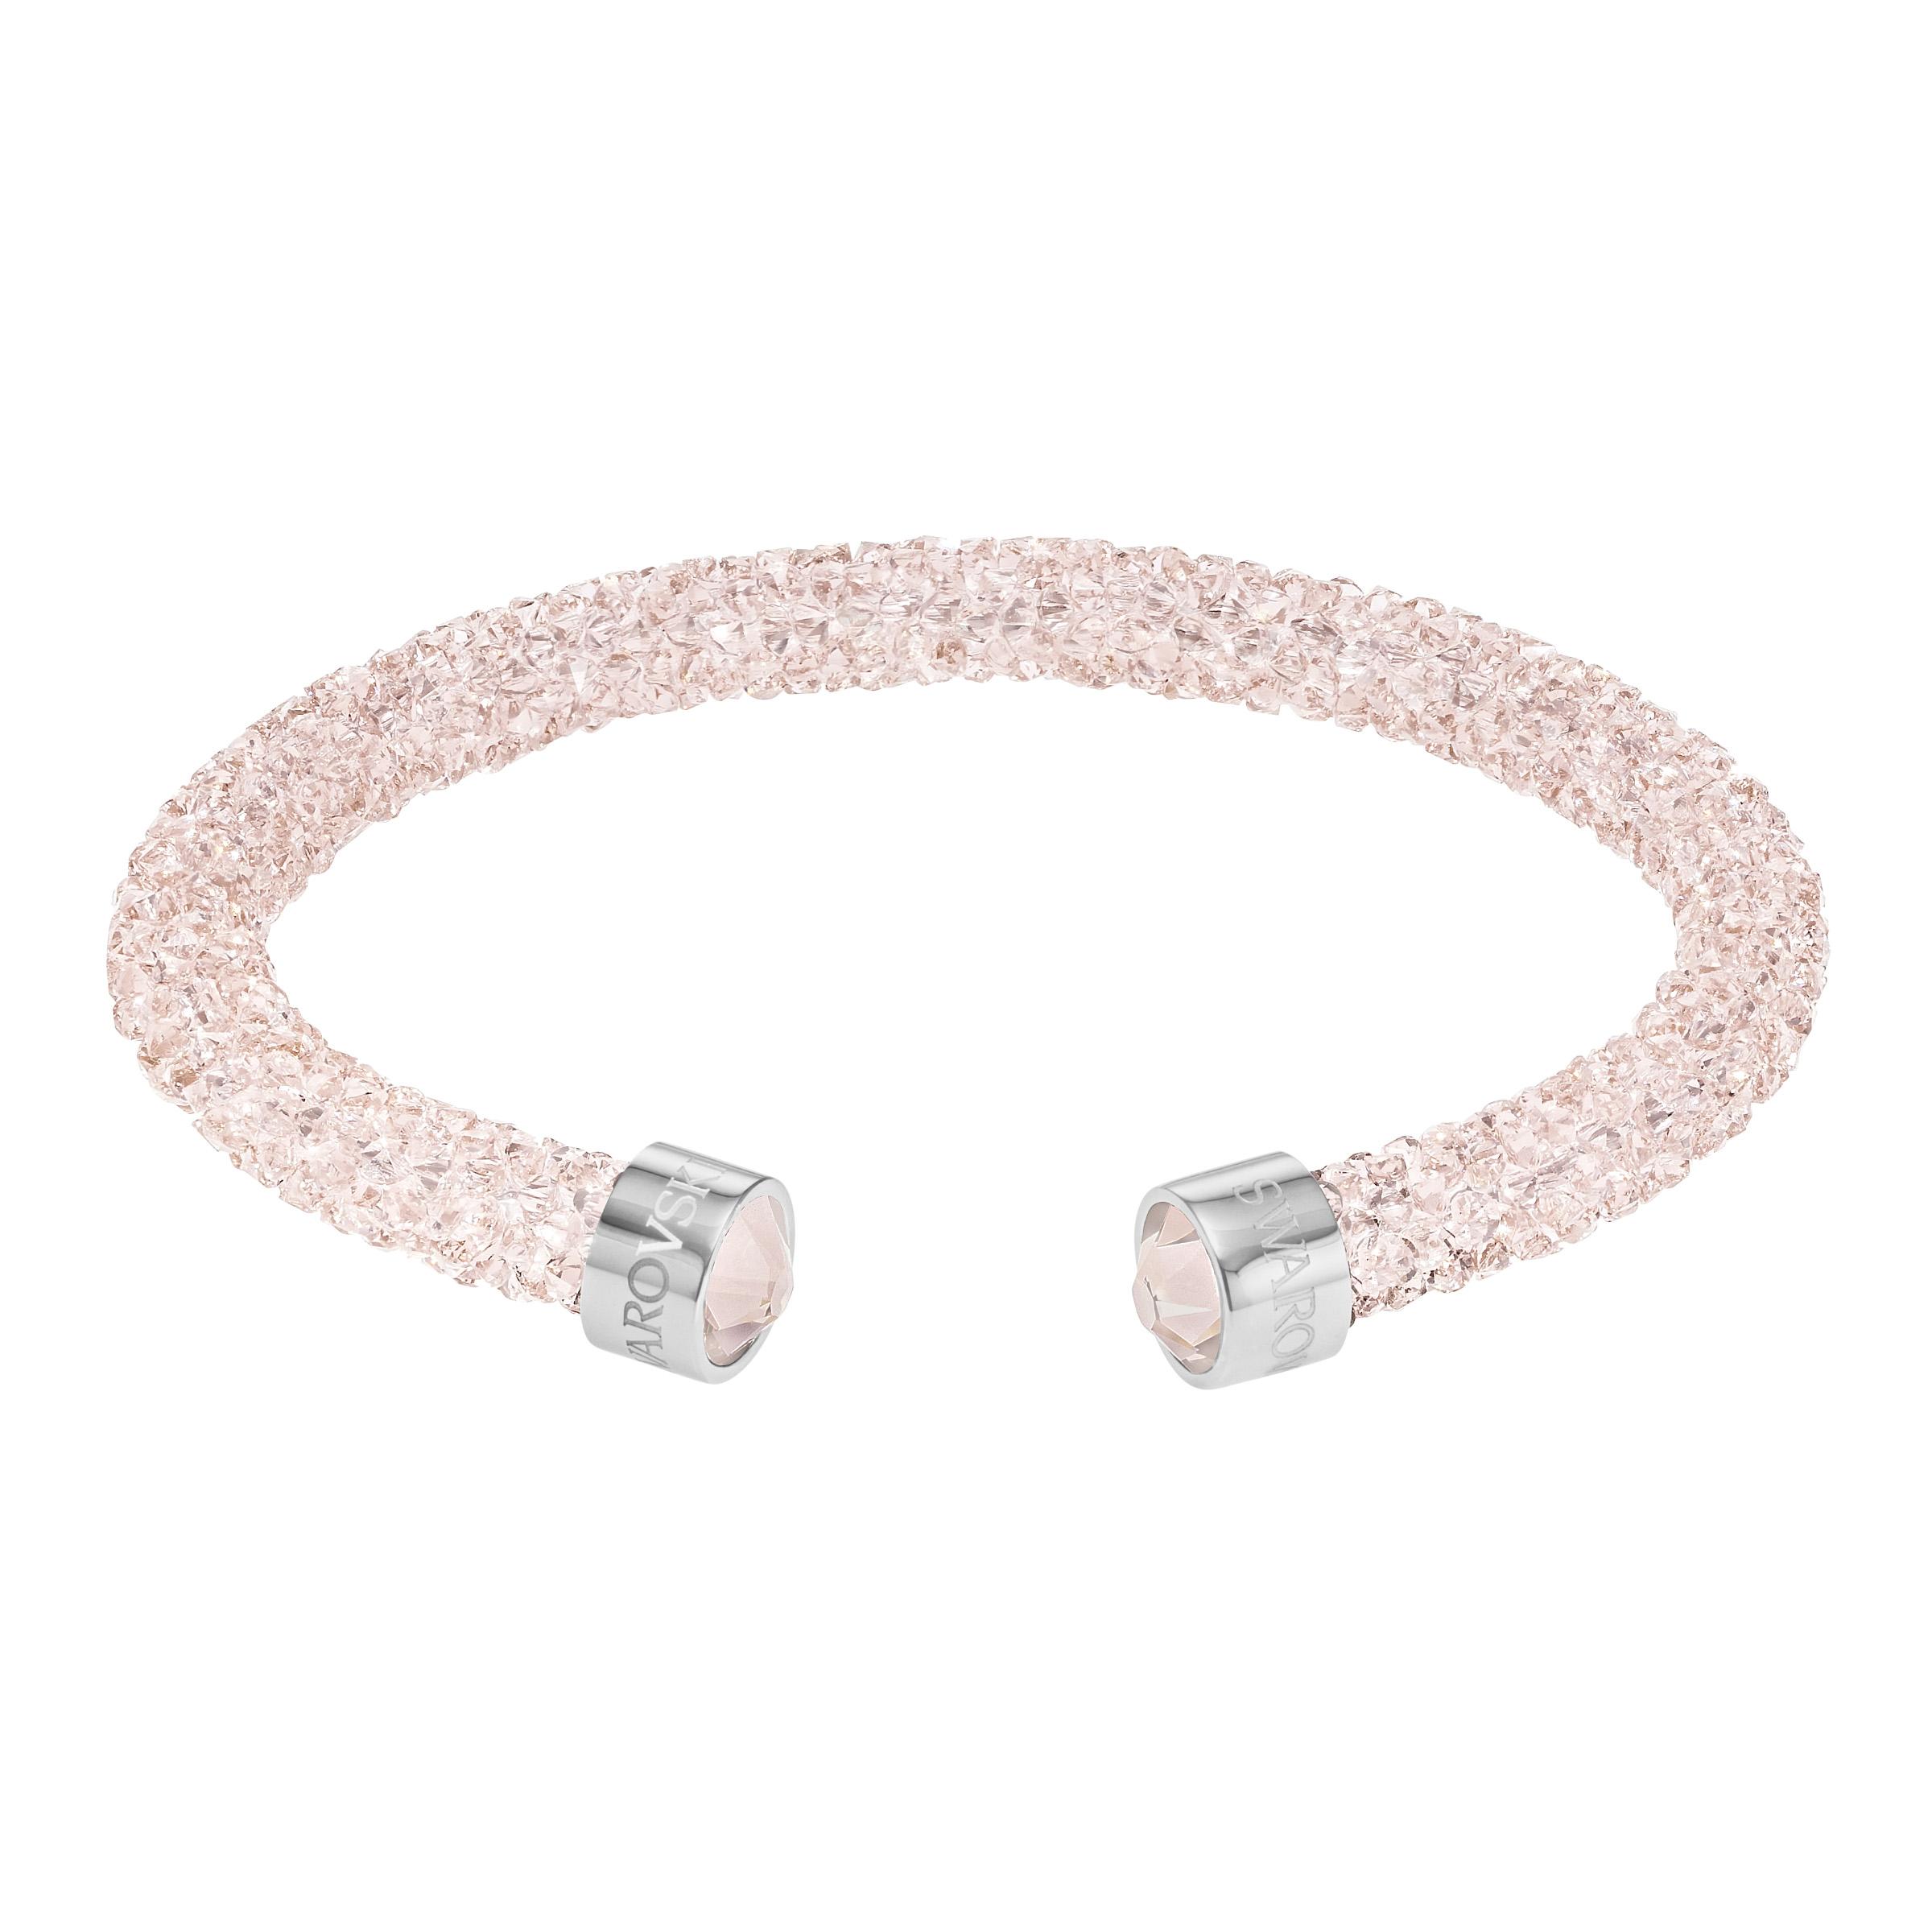 Manchette Swarovski Crystaldust, rose, acier inoxydable